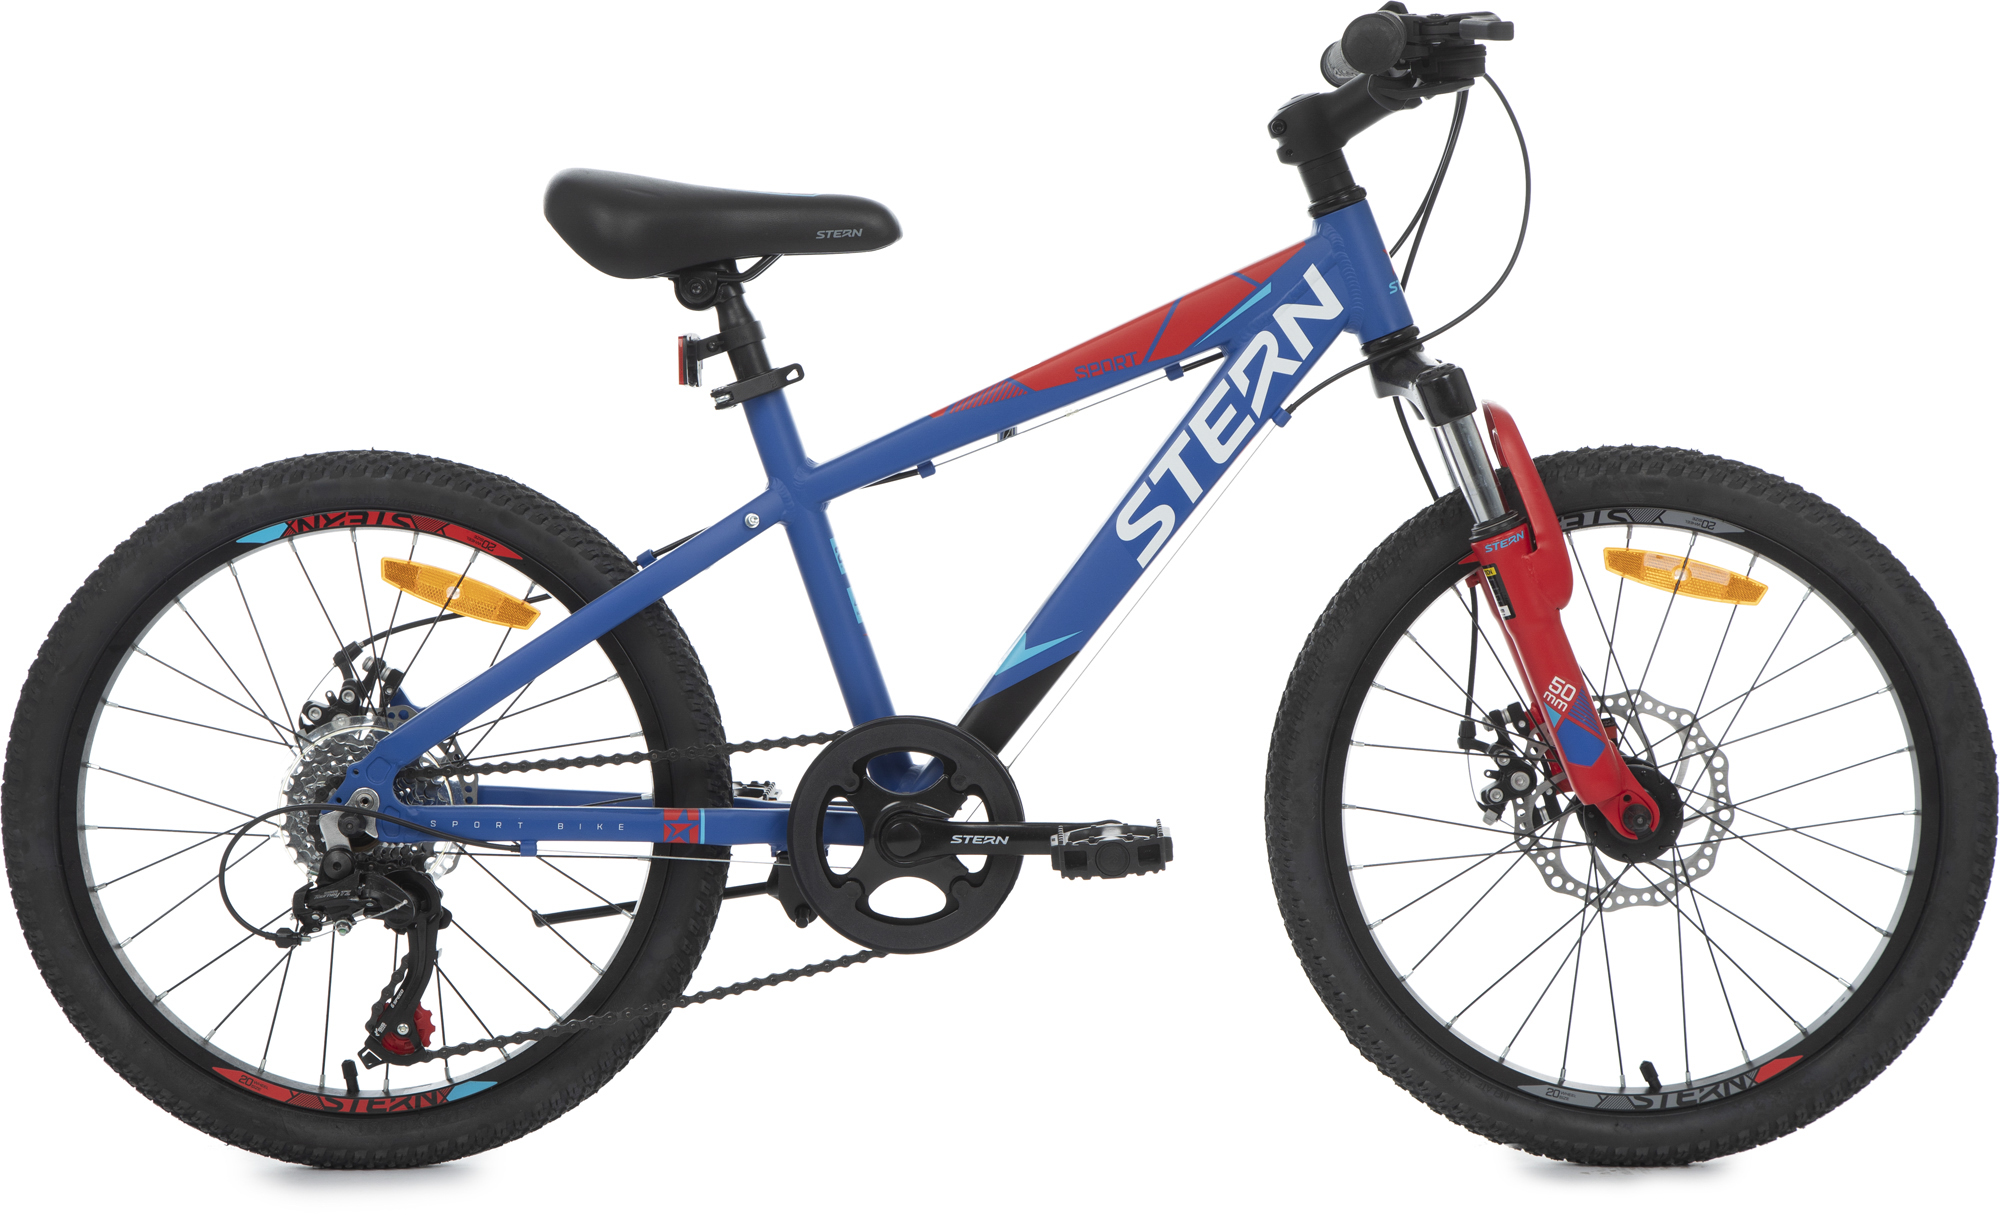 Stern Велосипед подростковый Stern Attack 20 Sport цена